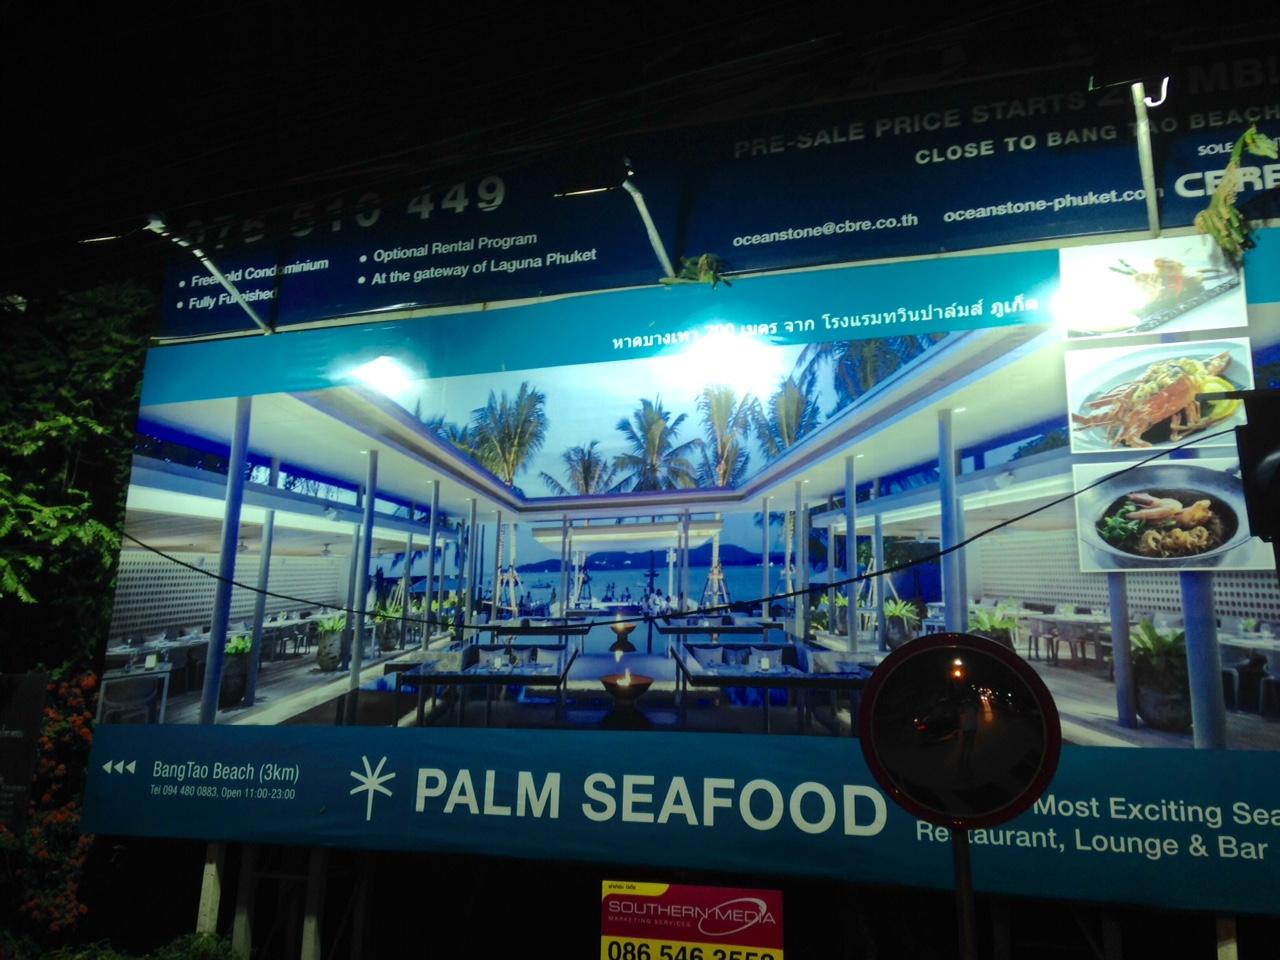 PalmSeafood.jpg